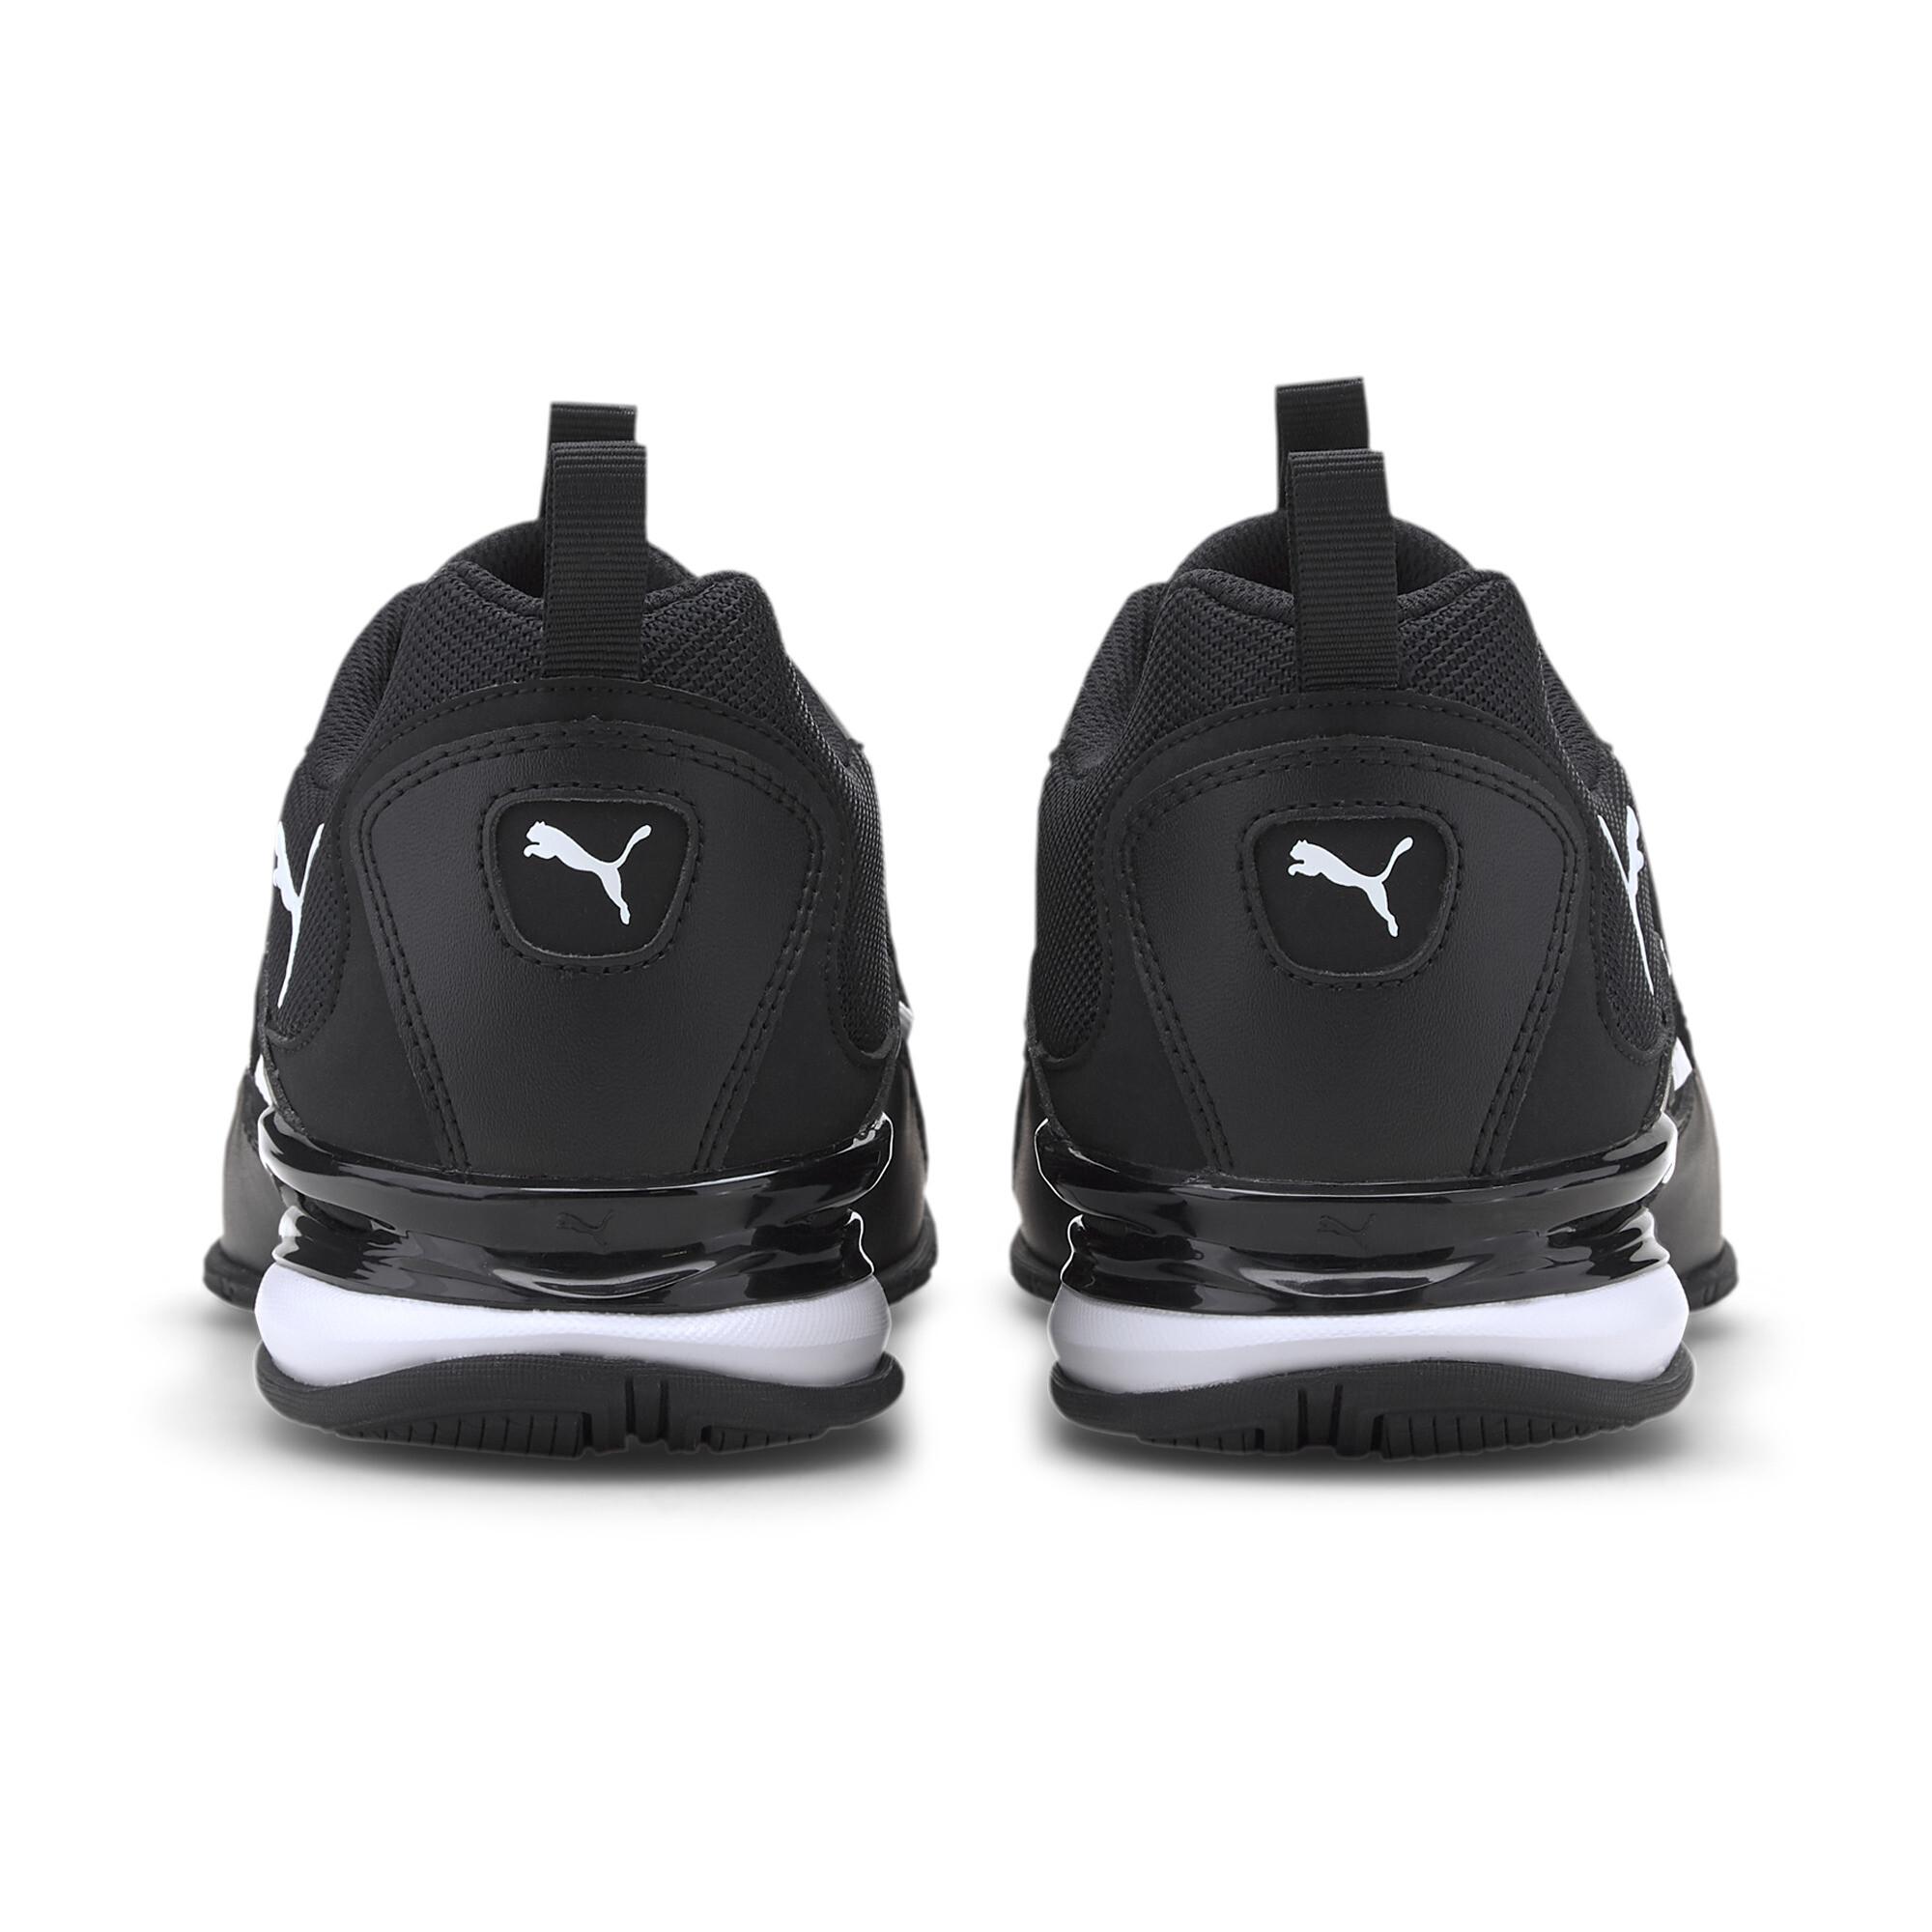 PUMA-Silverion-Men-s-Running-Shoes-Men-Shoe-Running thumbnail 8